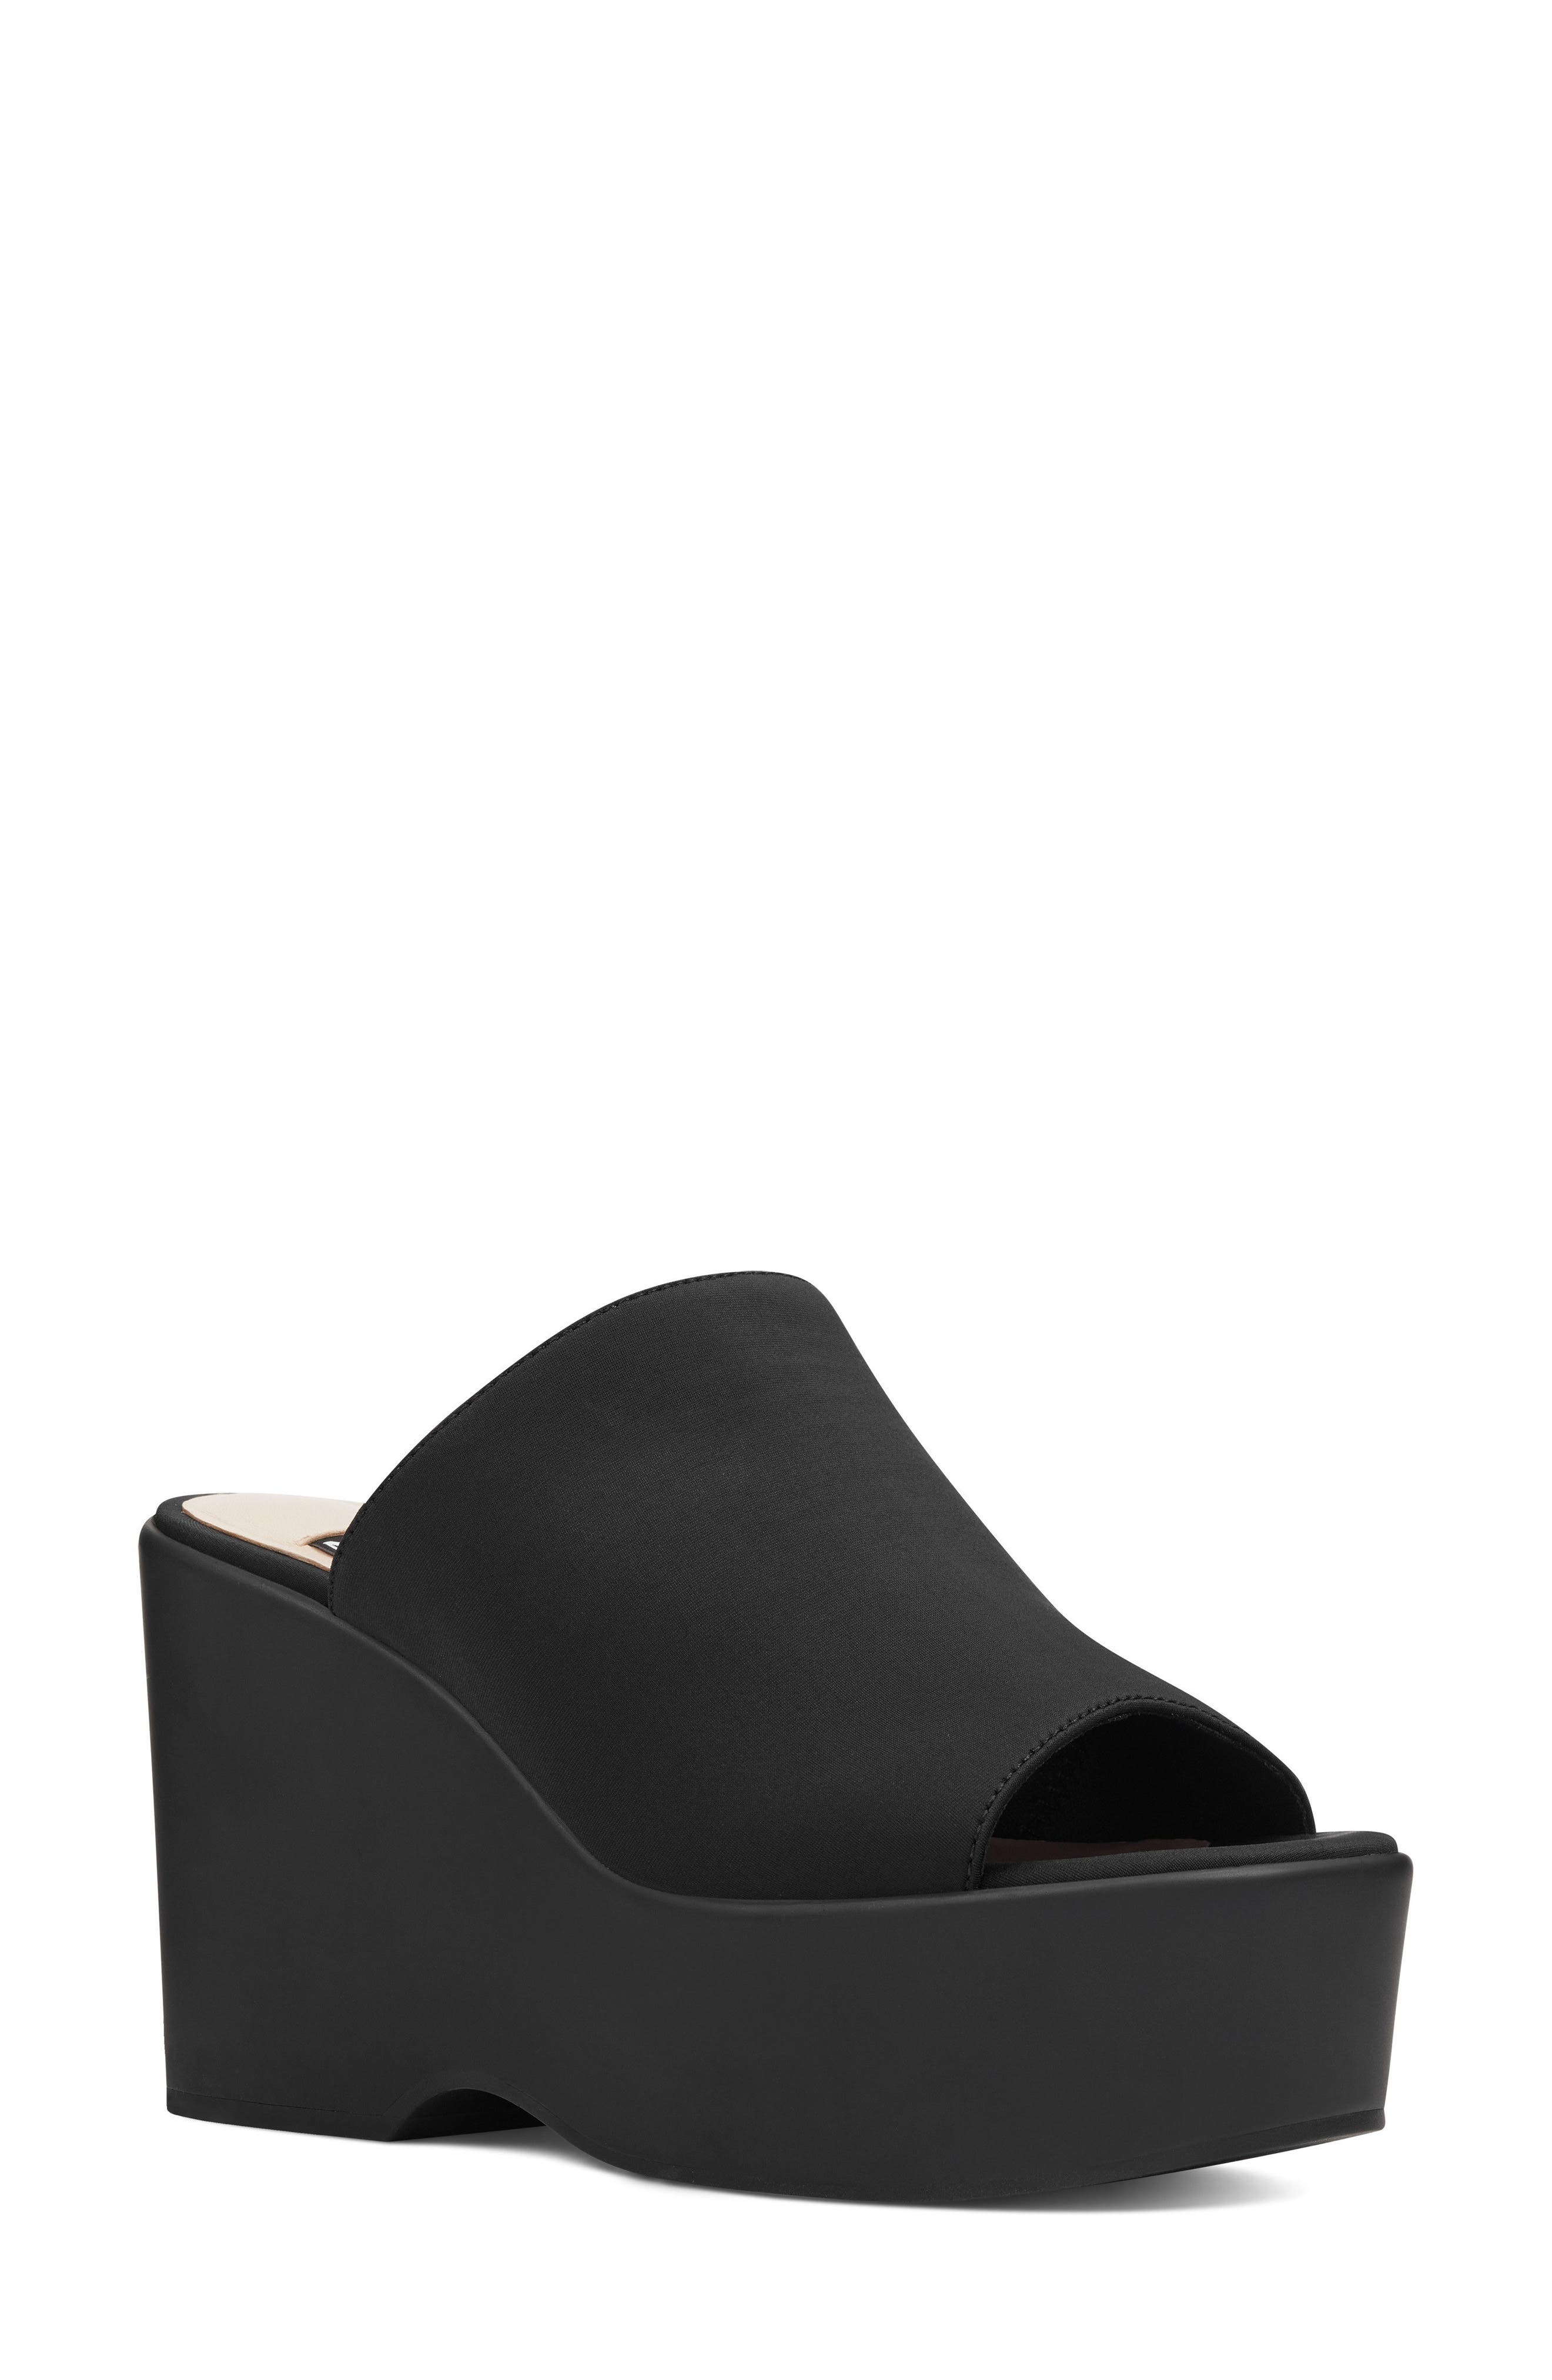 Tomo - 40th Anniversary Capsule Collection Platform Sandal,                             Main thumbnail 1, color,                             BLACK FABRIC